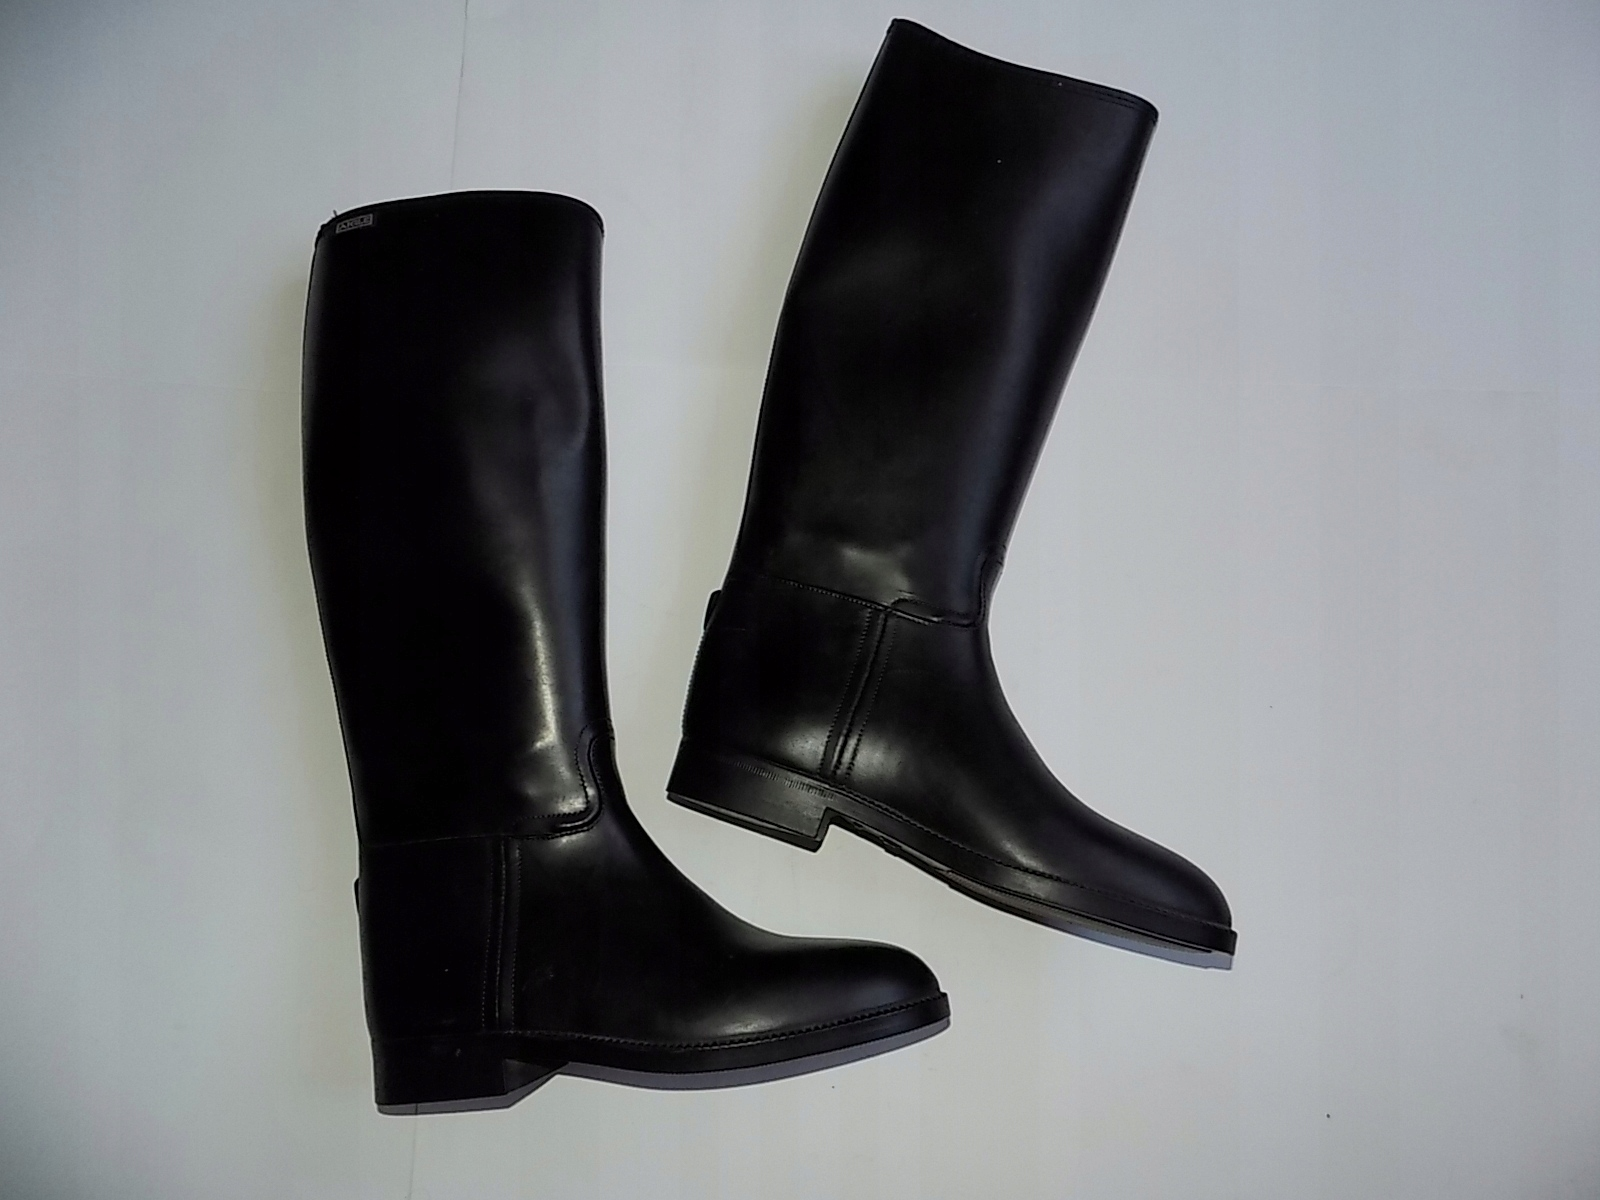 cc0ccb7f73c5e Aigle buty damskie na koń sztyblety jeździeckie 40 - 7506517734 ...